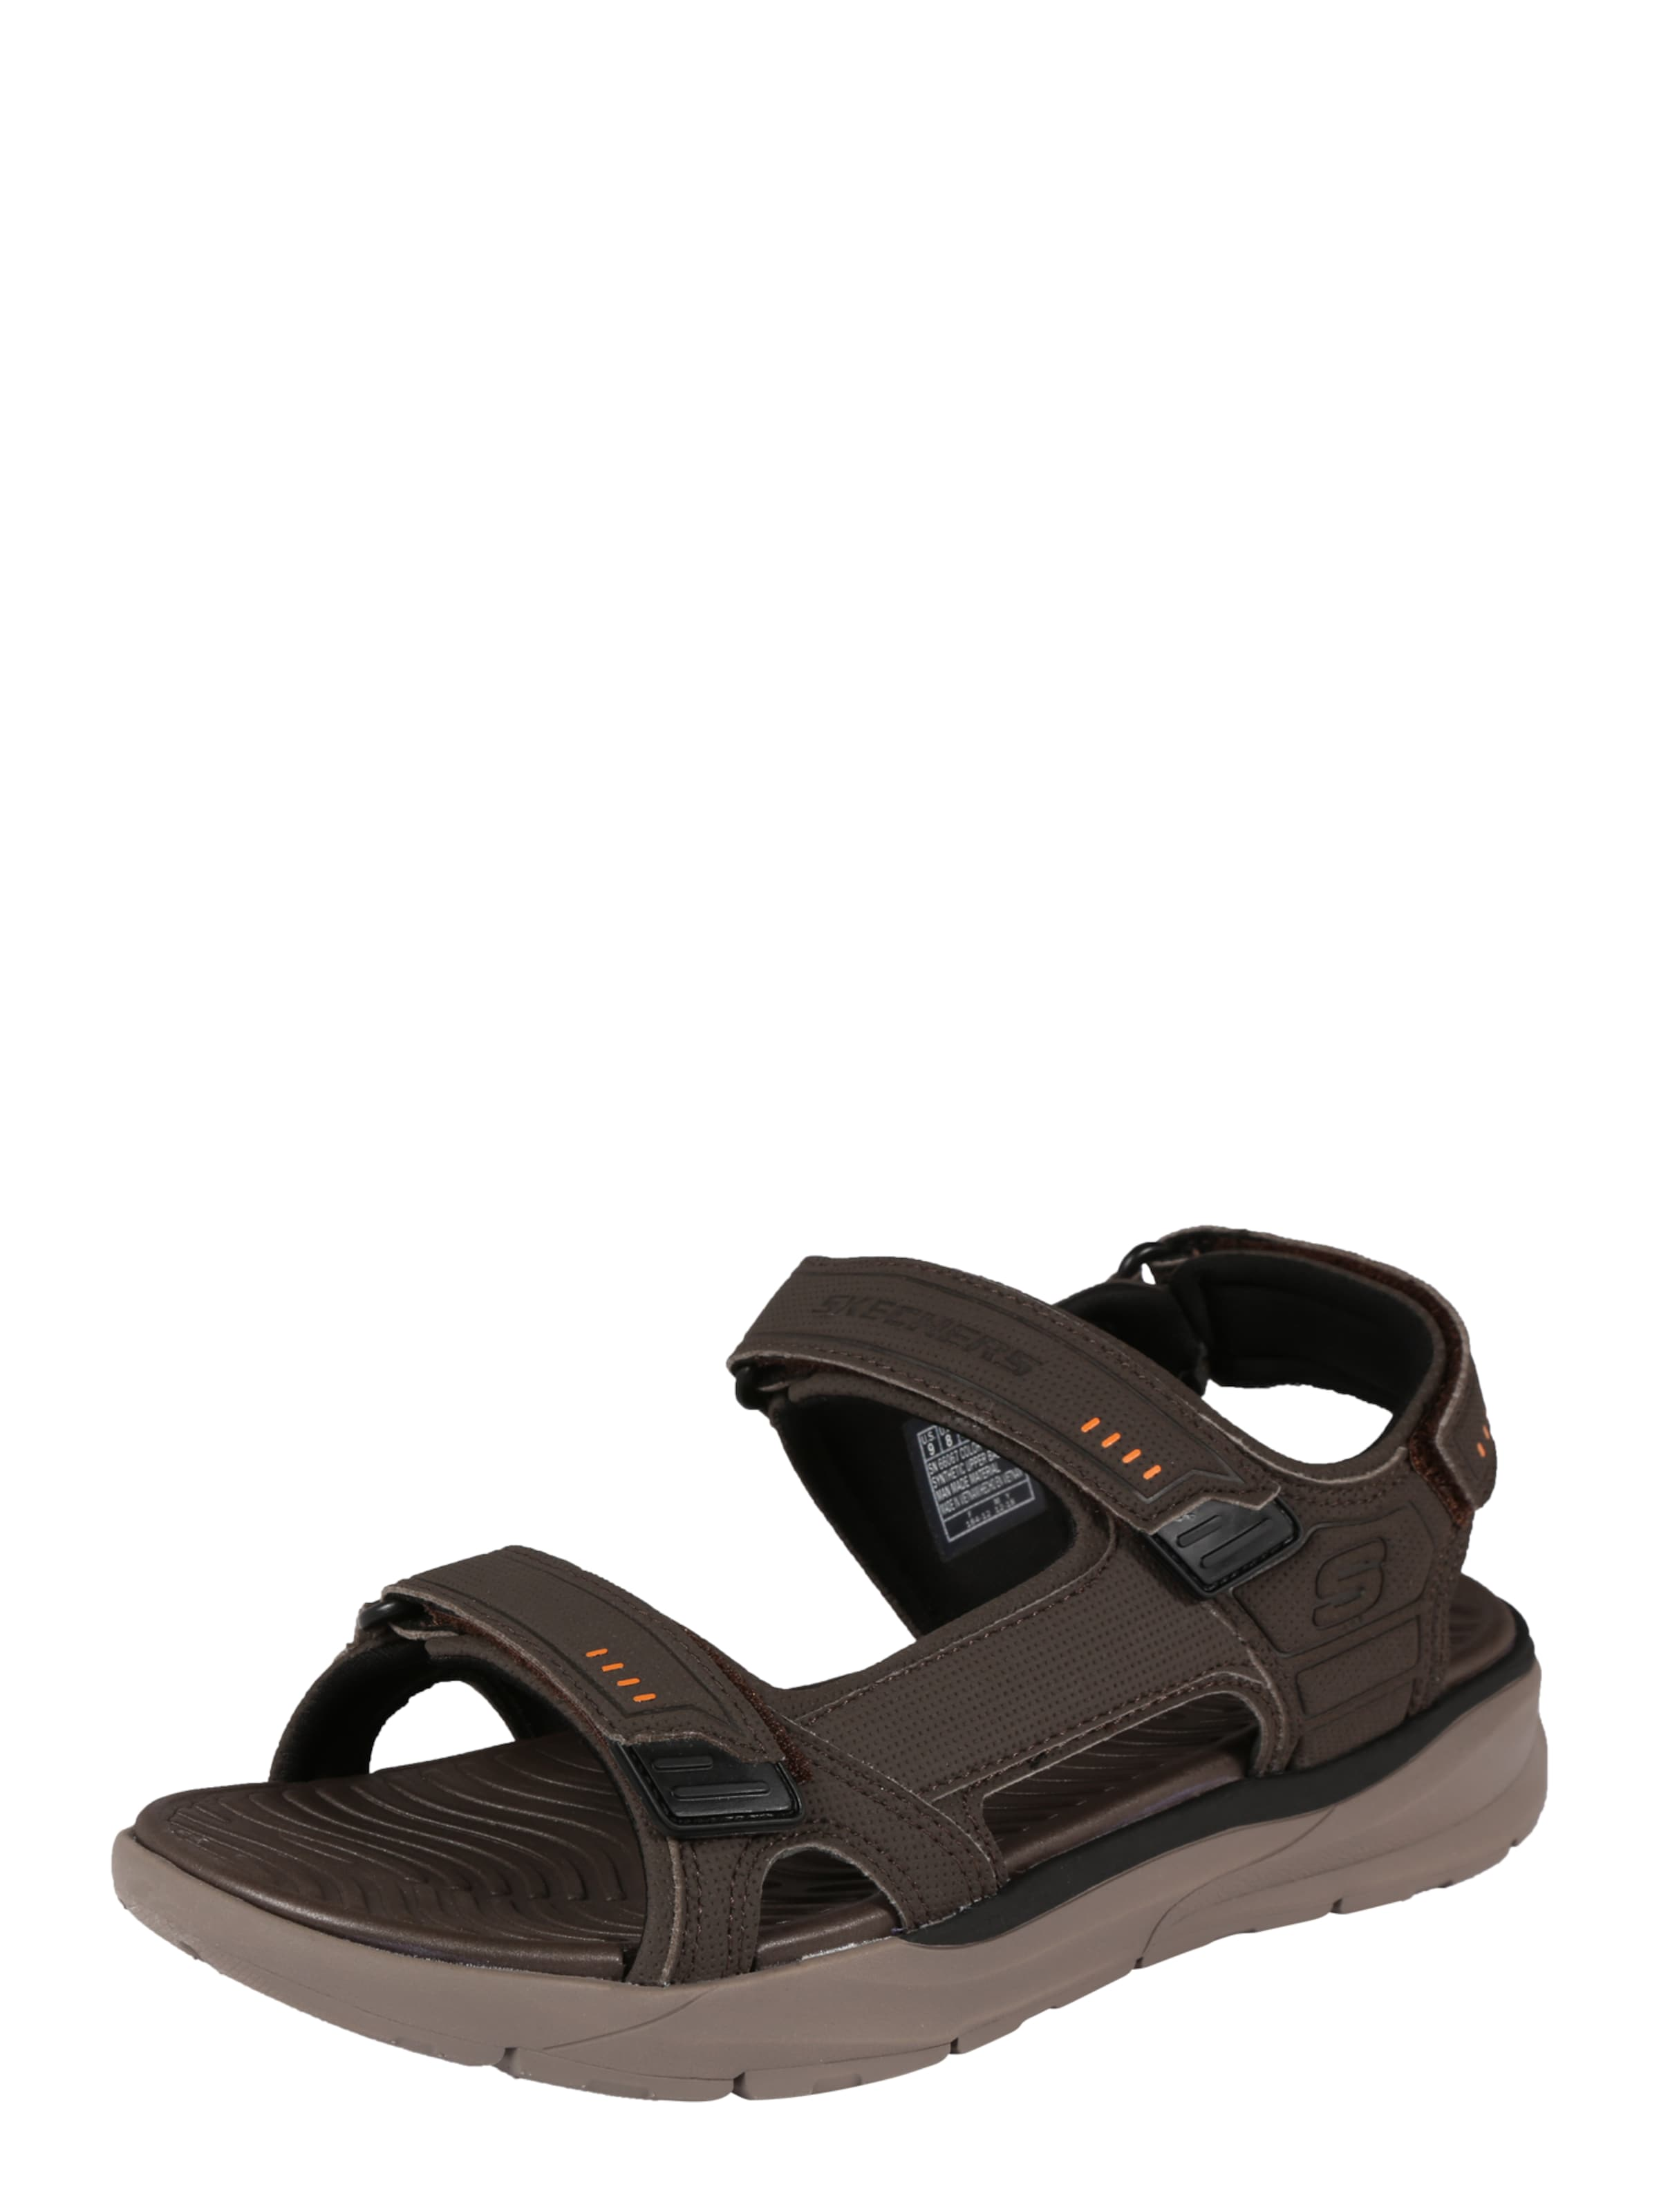 'reloneSenco' Sandales Marron Skechers En cARS54jL3q